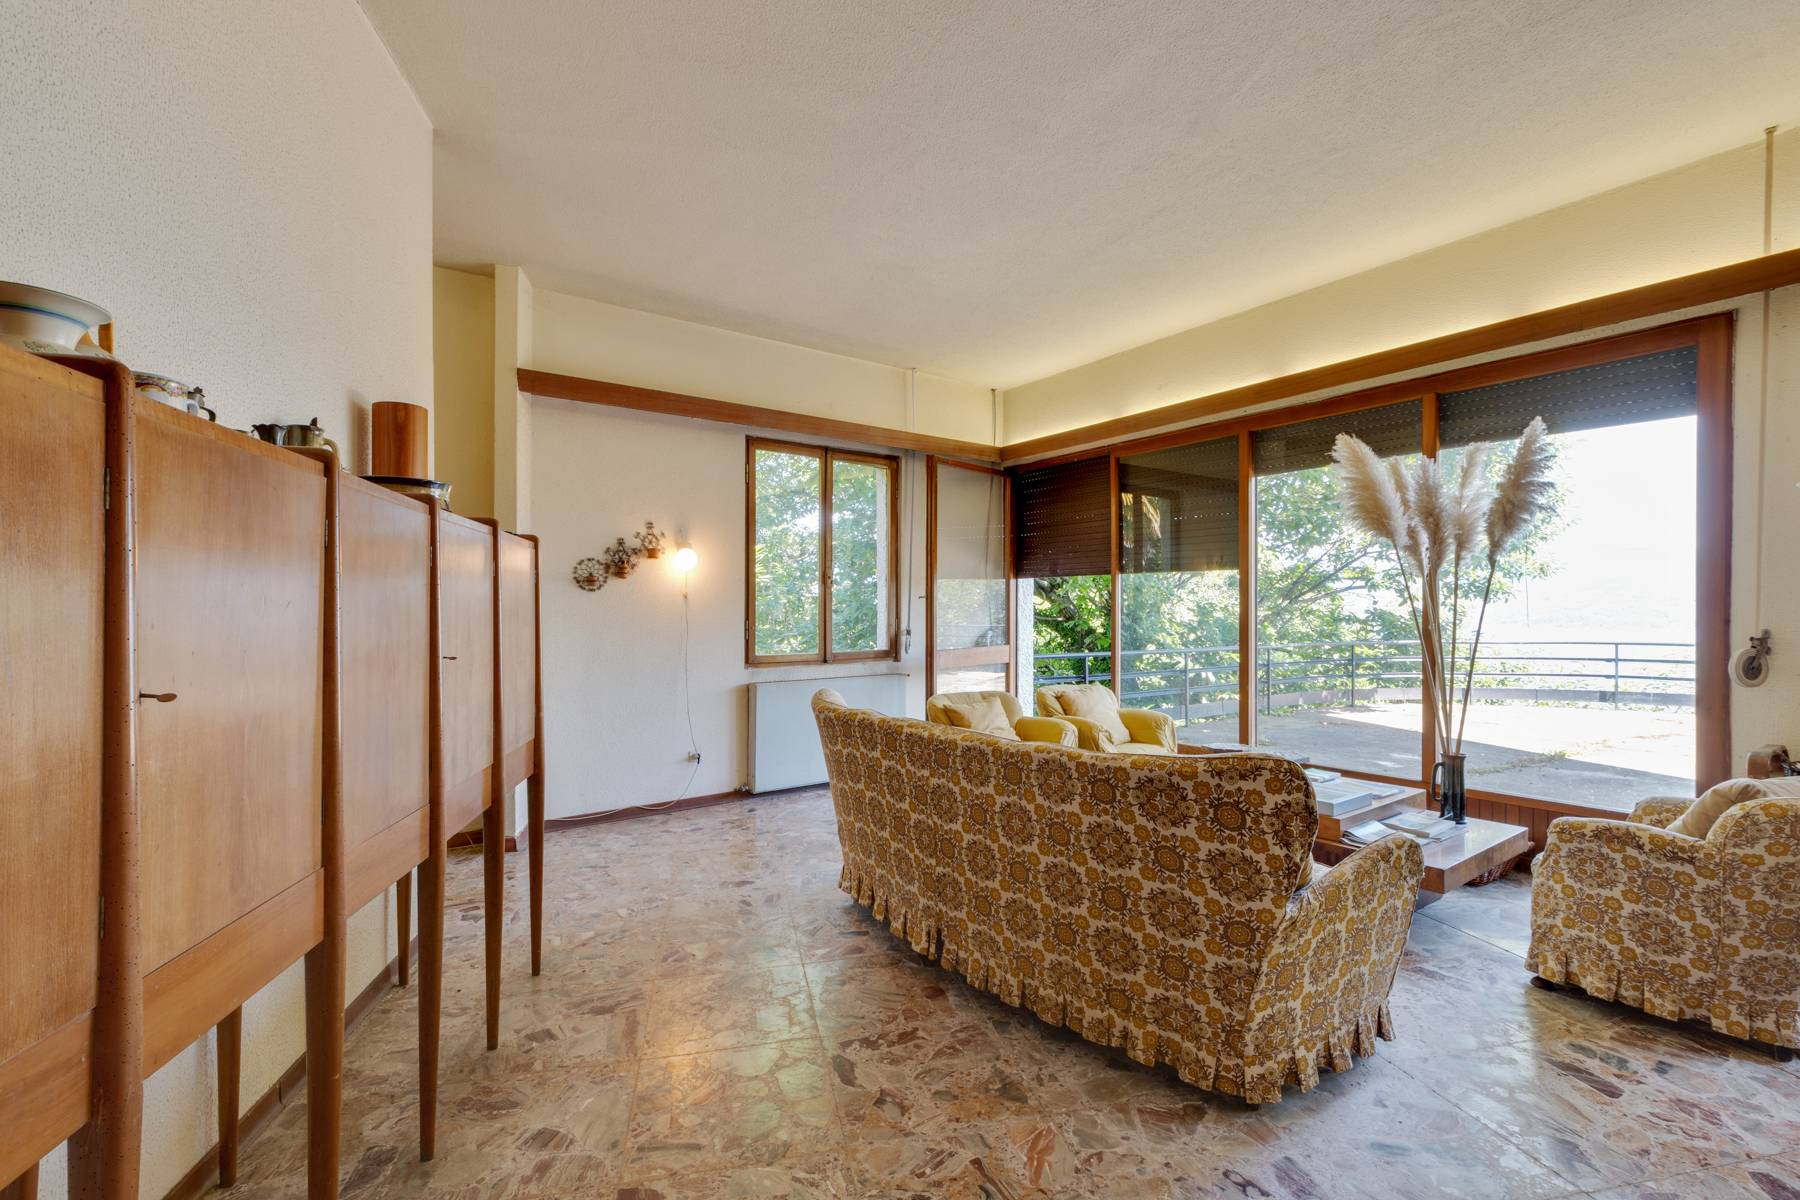 Villa in Vendita a Stresa: 5 locali, 150 mq - Foto 7